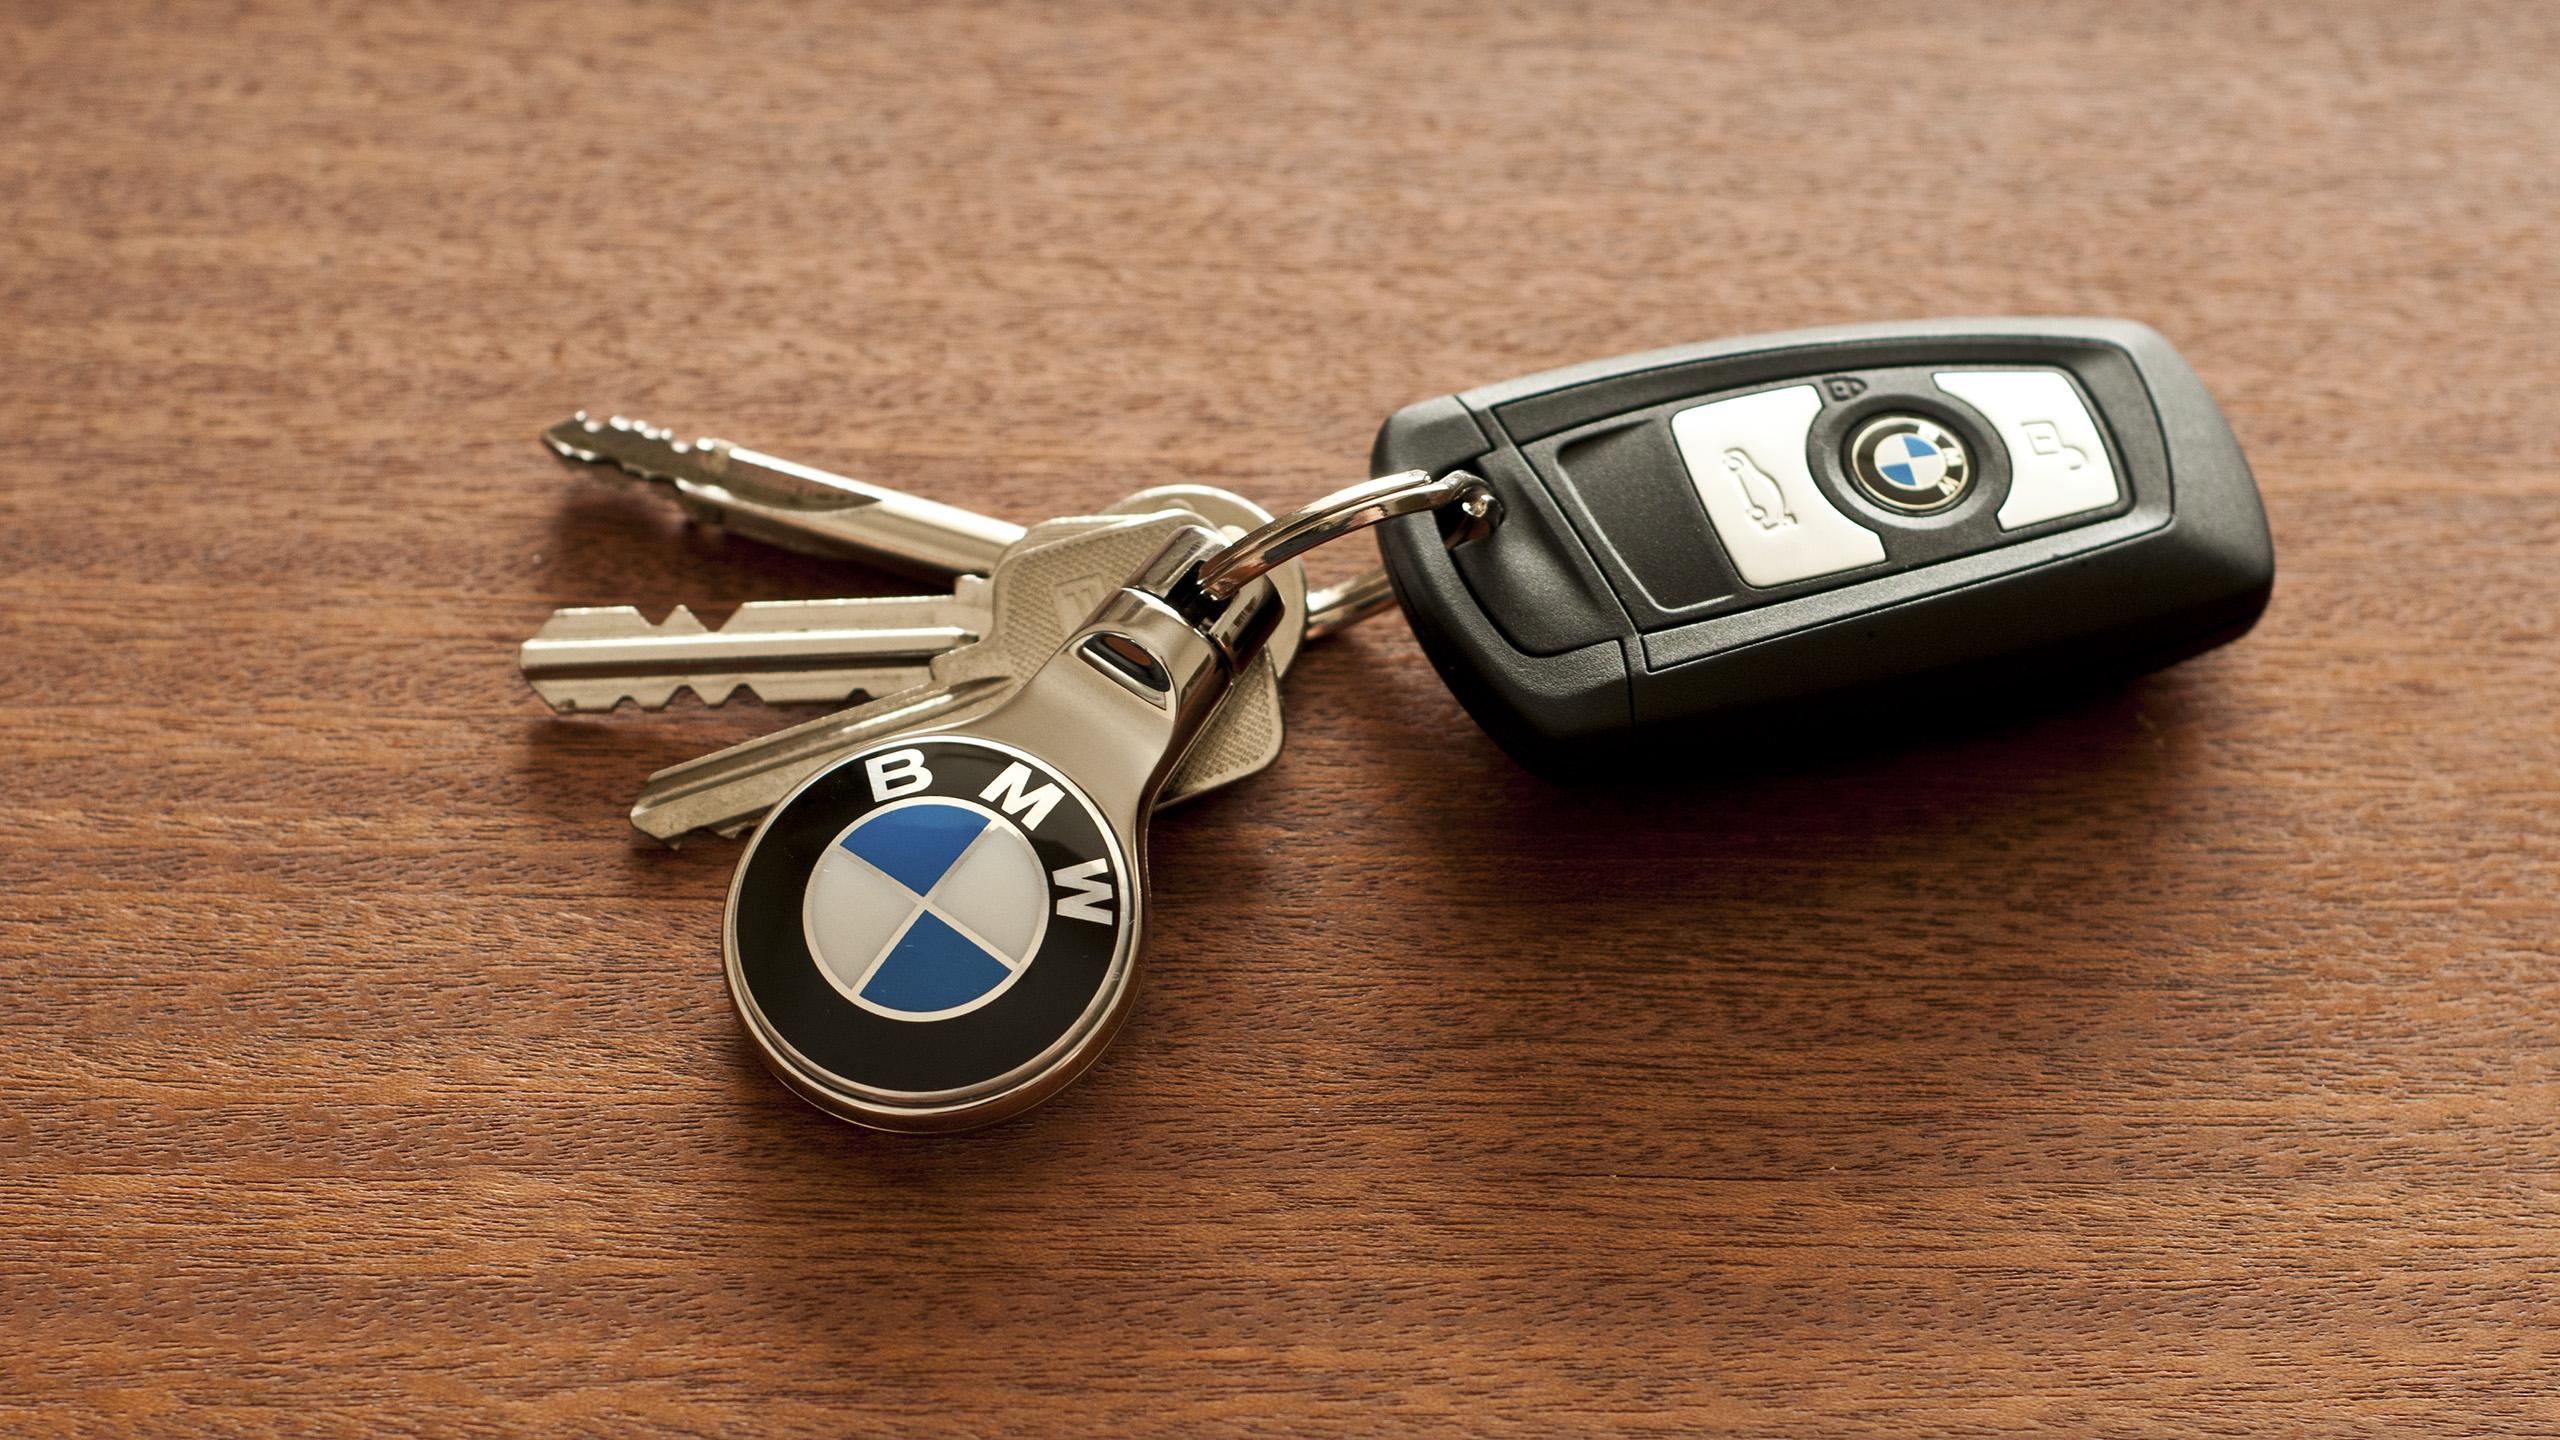 Scazziga Industrial Design › BMW Keychain 35165d44f034